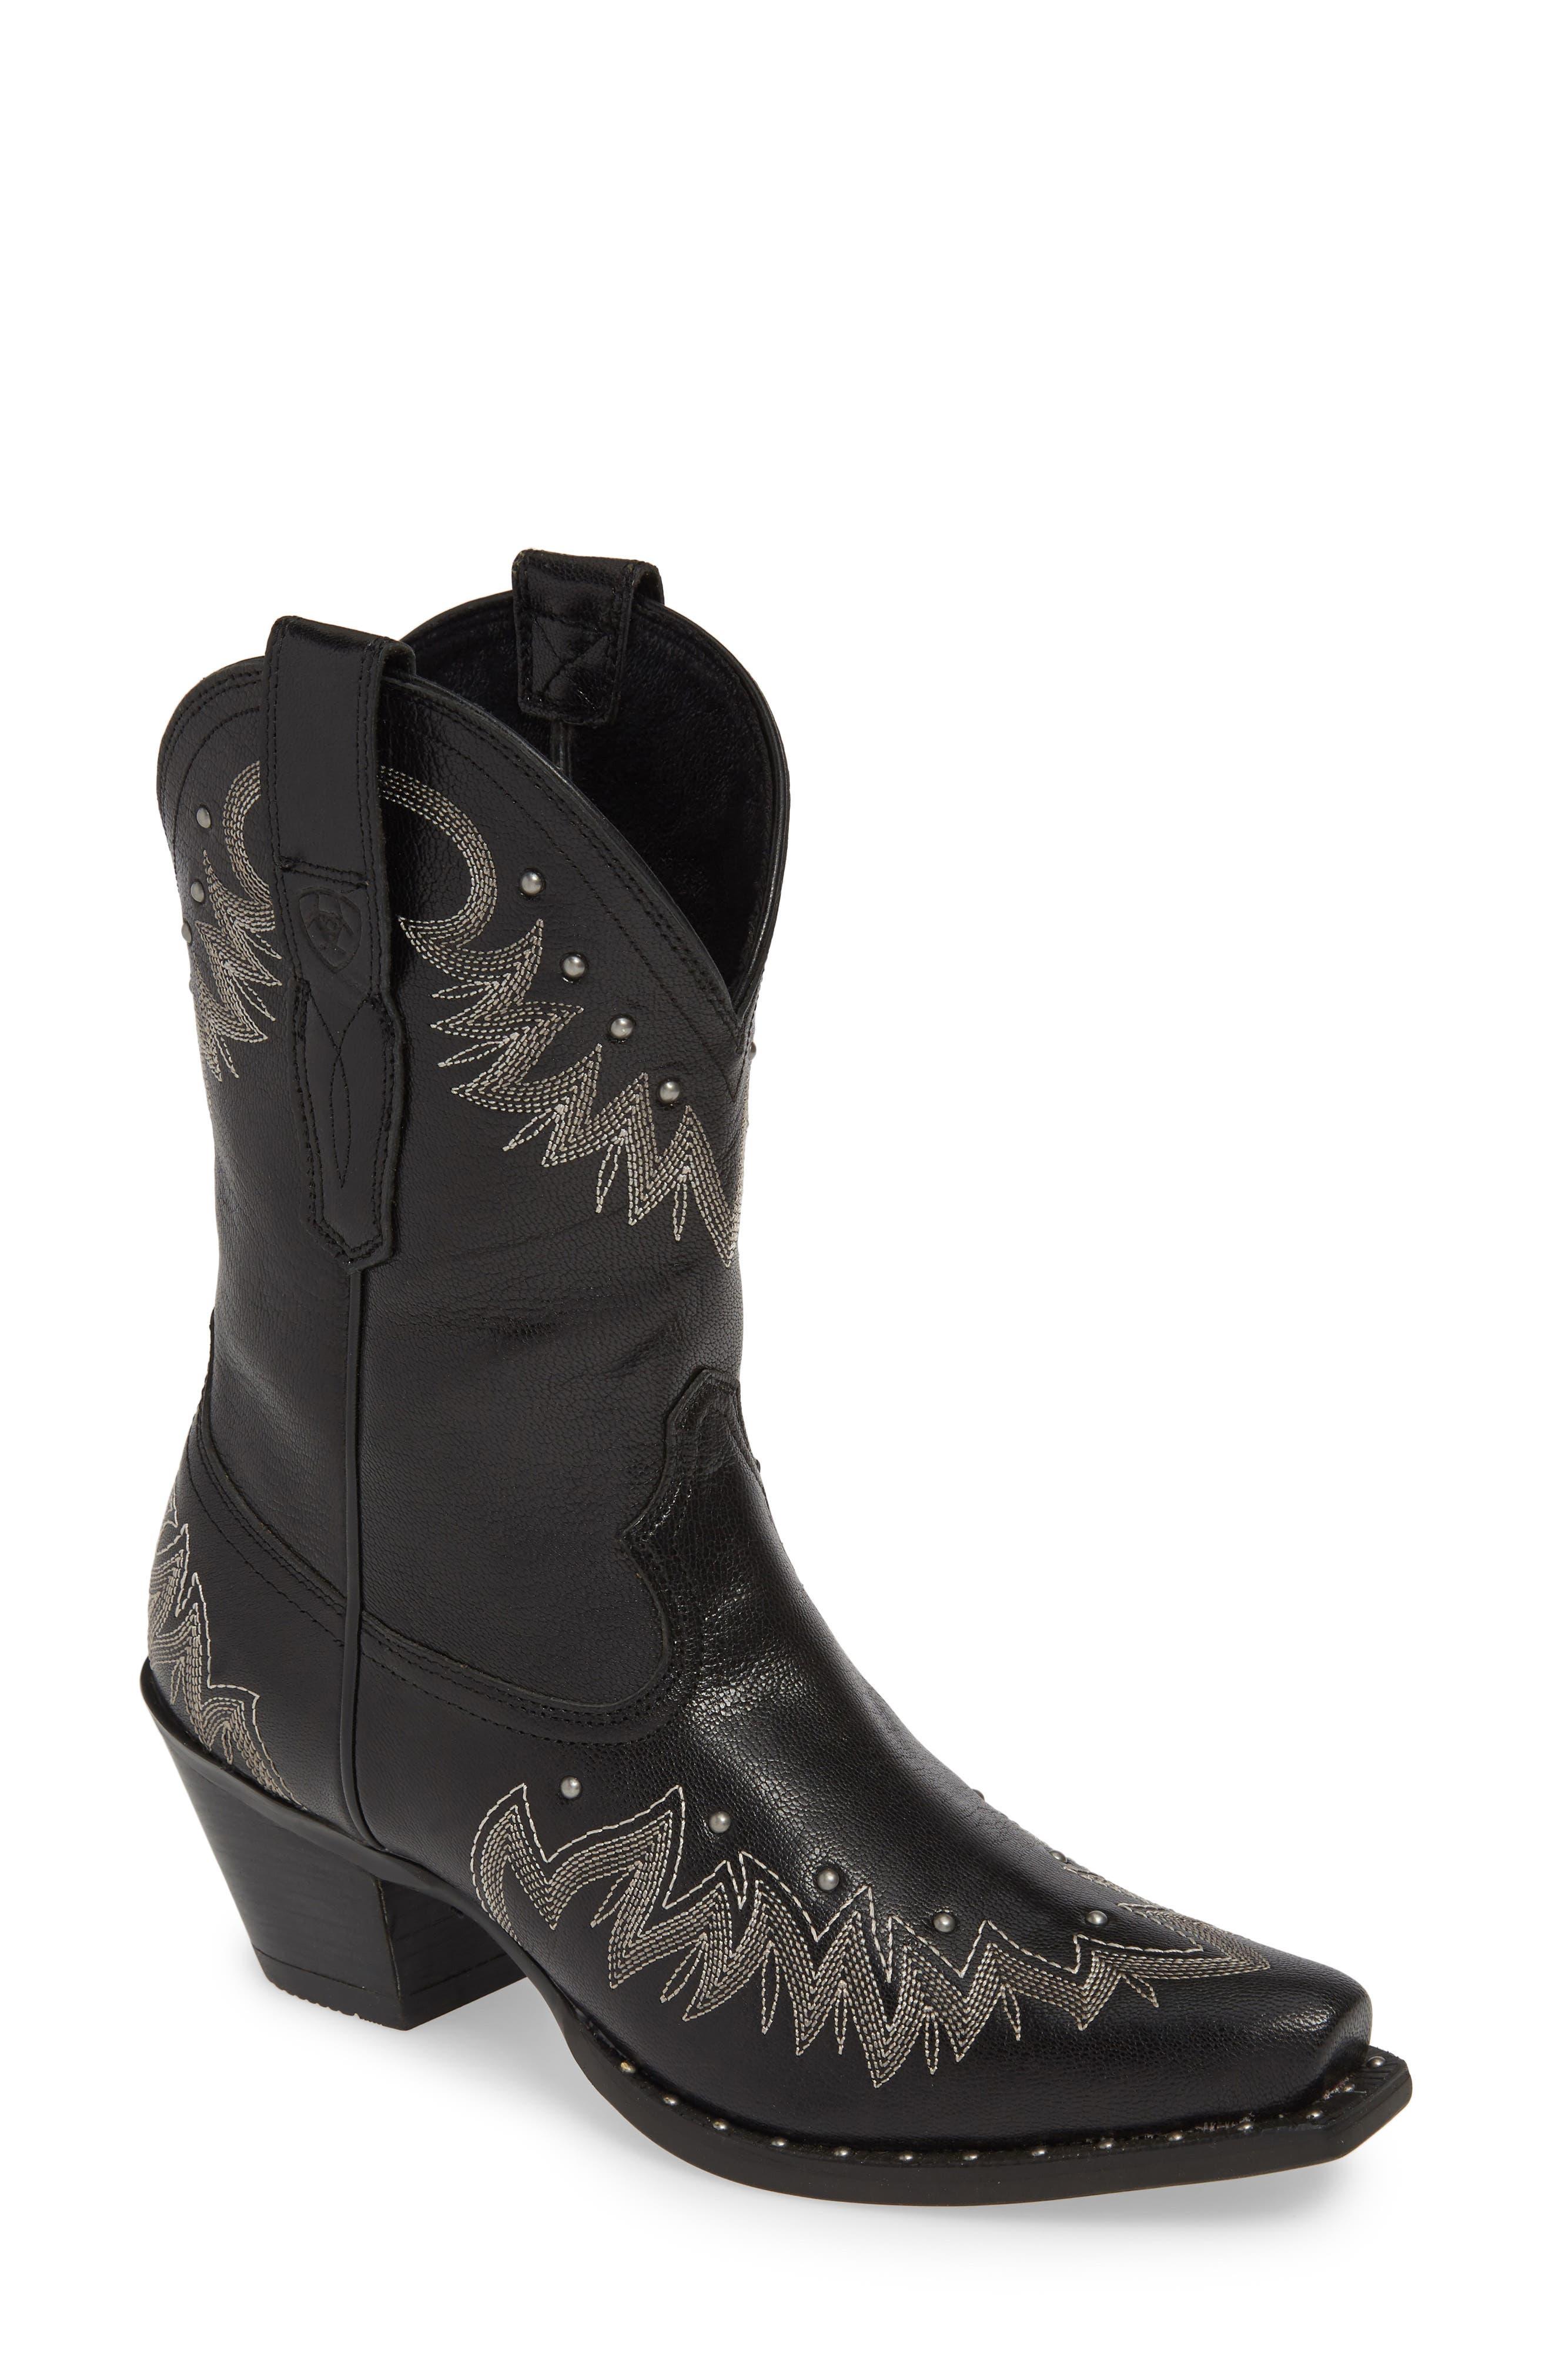 Ariat Potrero Western Boot- Black